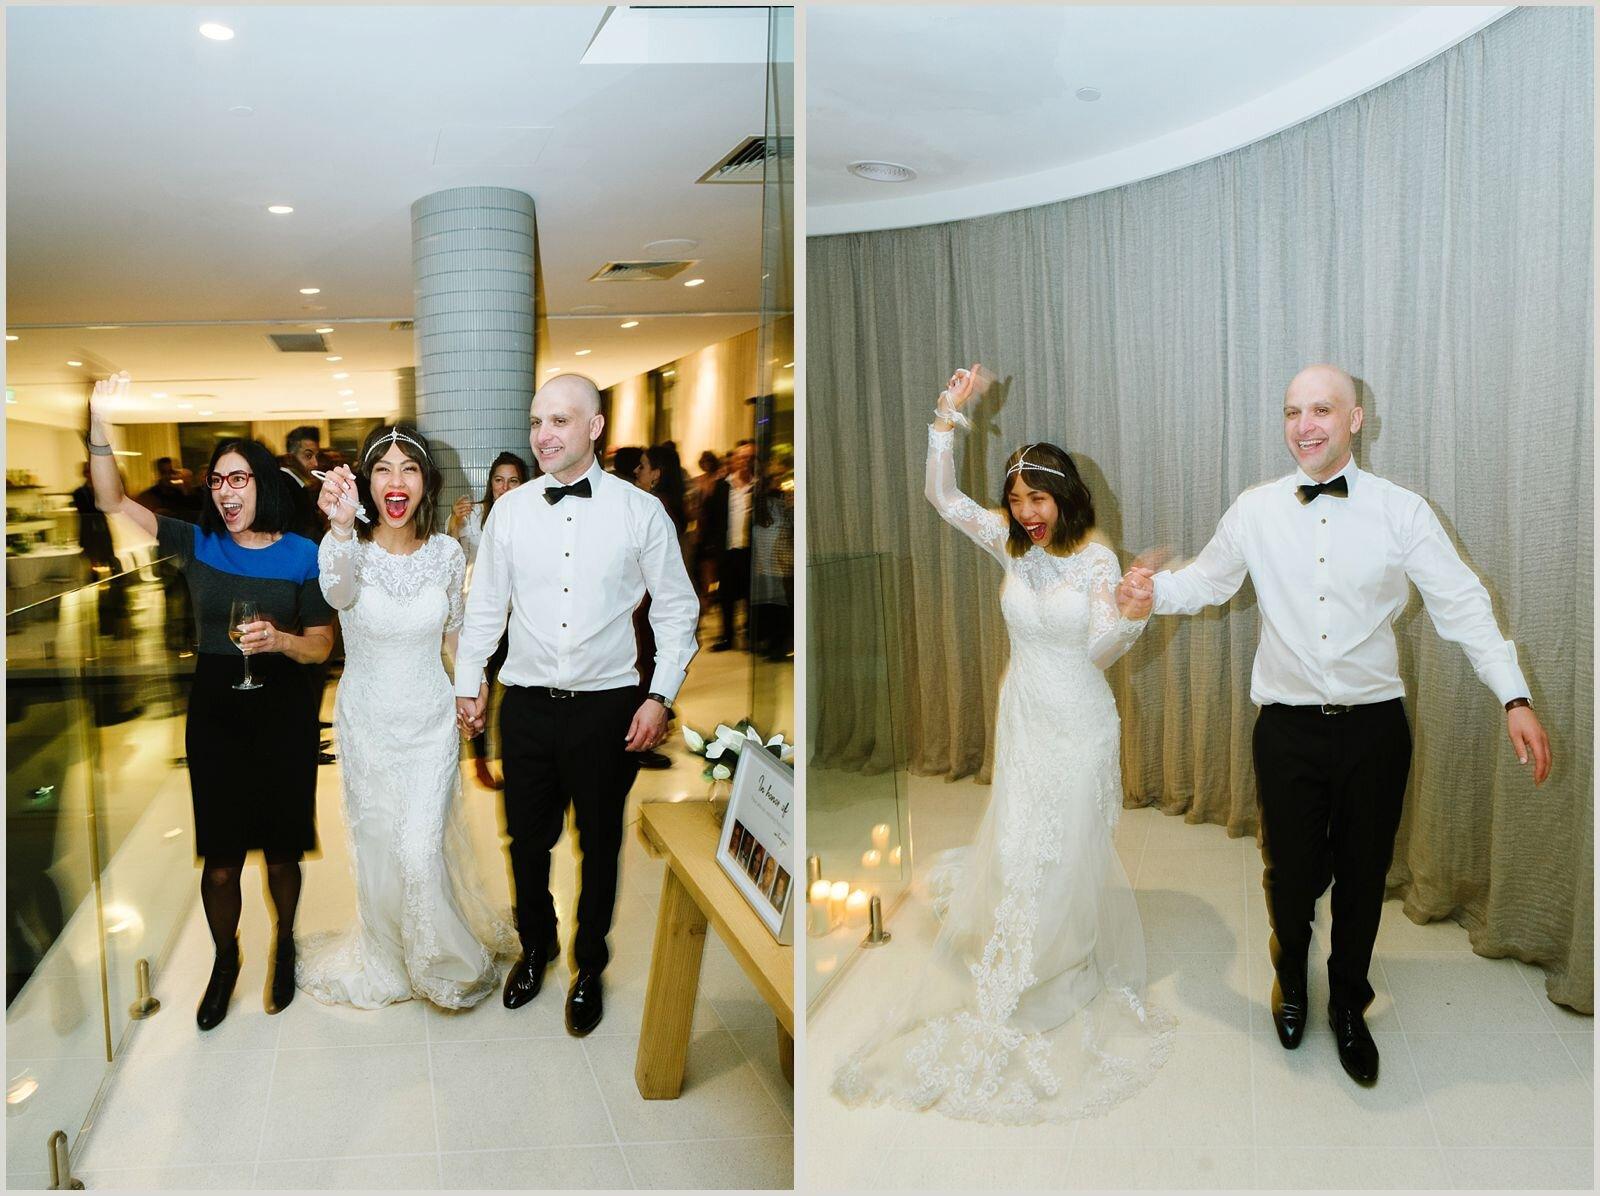 joseph_koprek_wedding_melbourne_the_prince_deck_0102.jpg